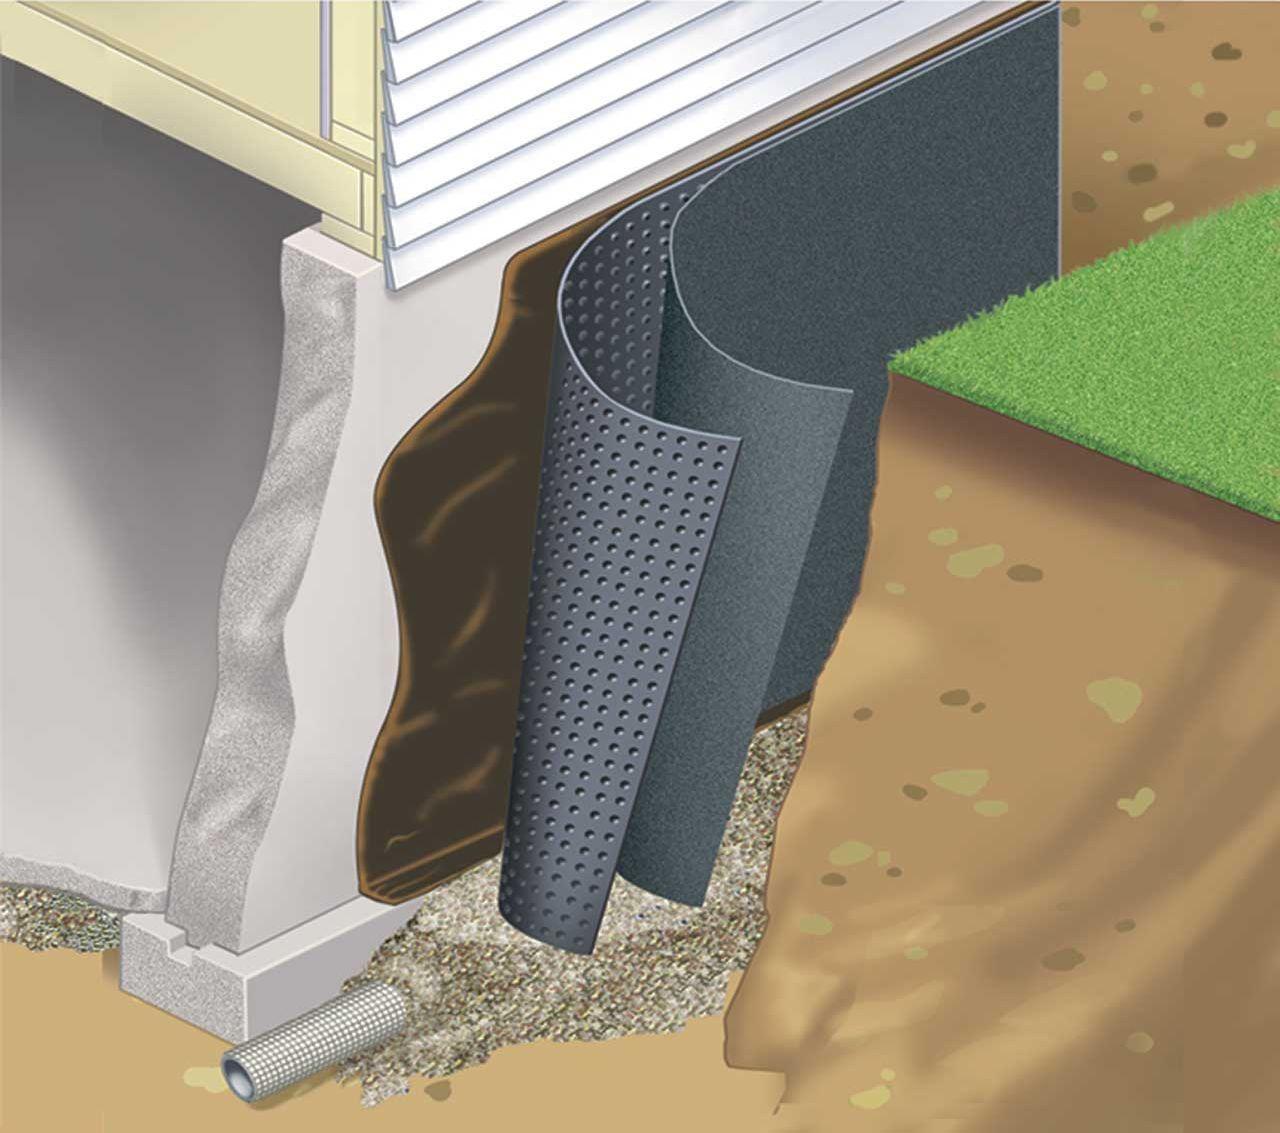 Exterior Waterproofing Membrane Foundation Wall U S Waterproofing In 2020 Wall Waterproofing Basement Walls Waterproofing Basement Walls